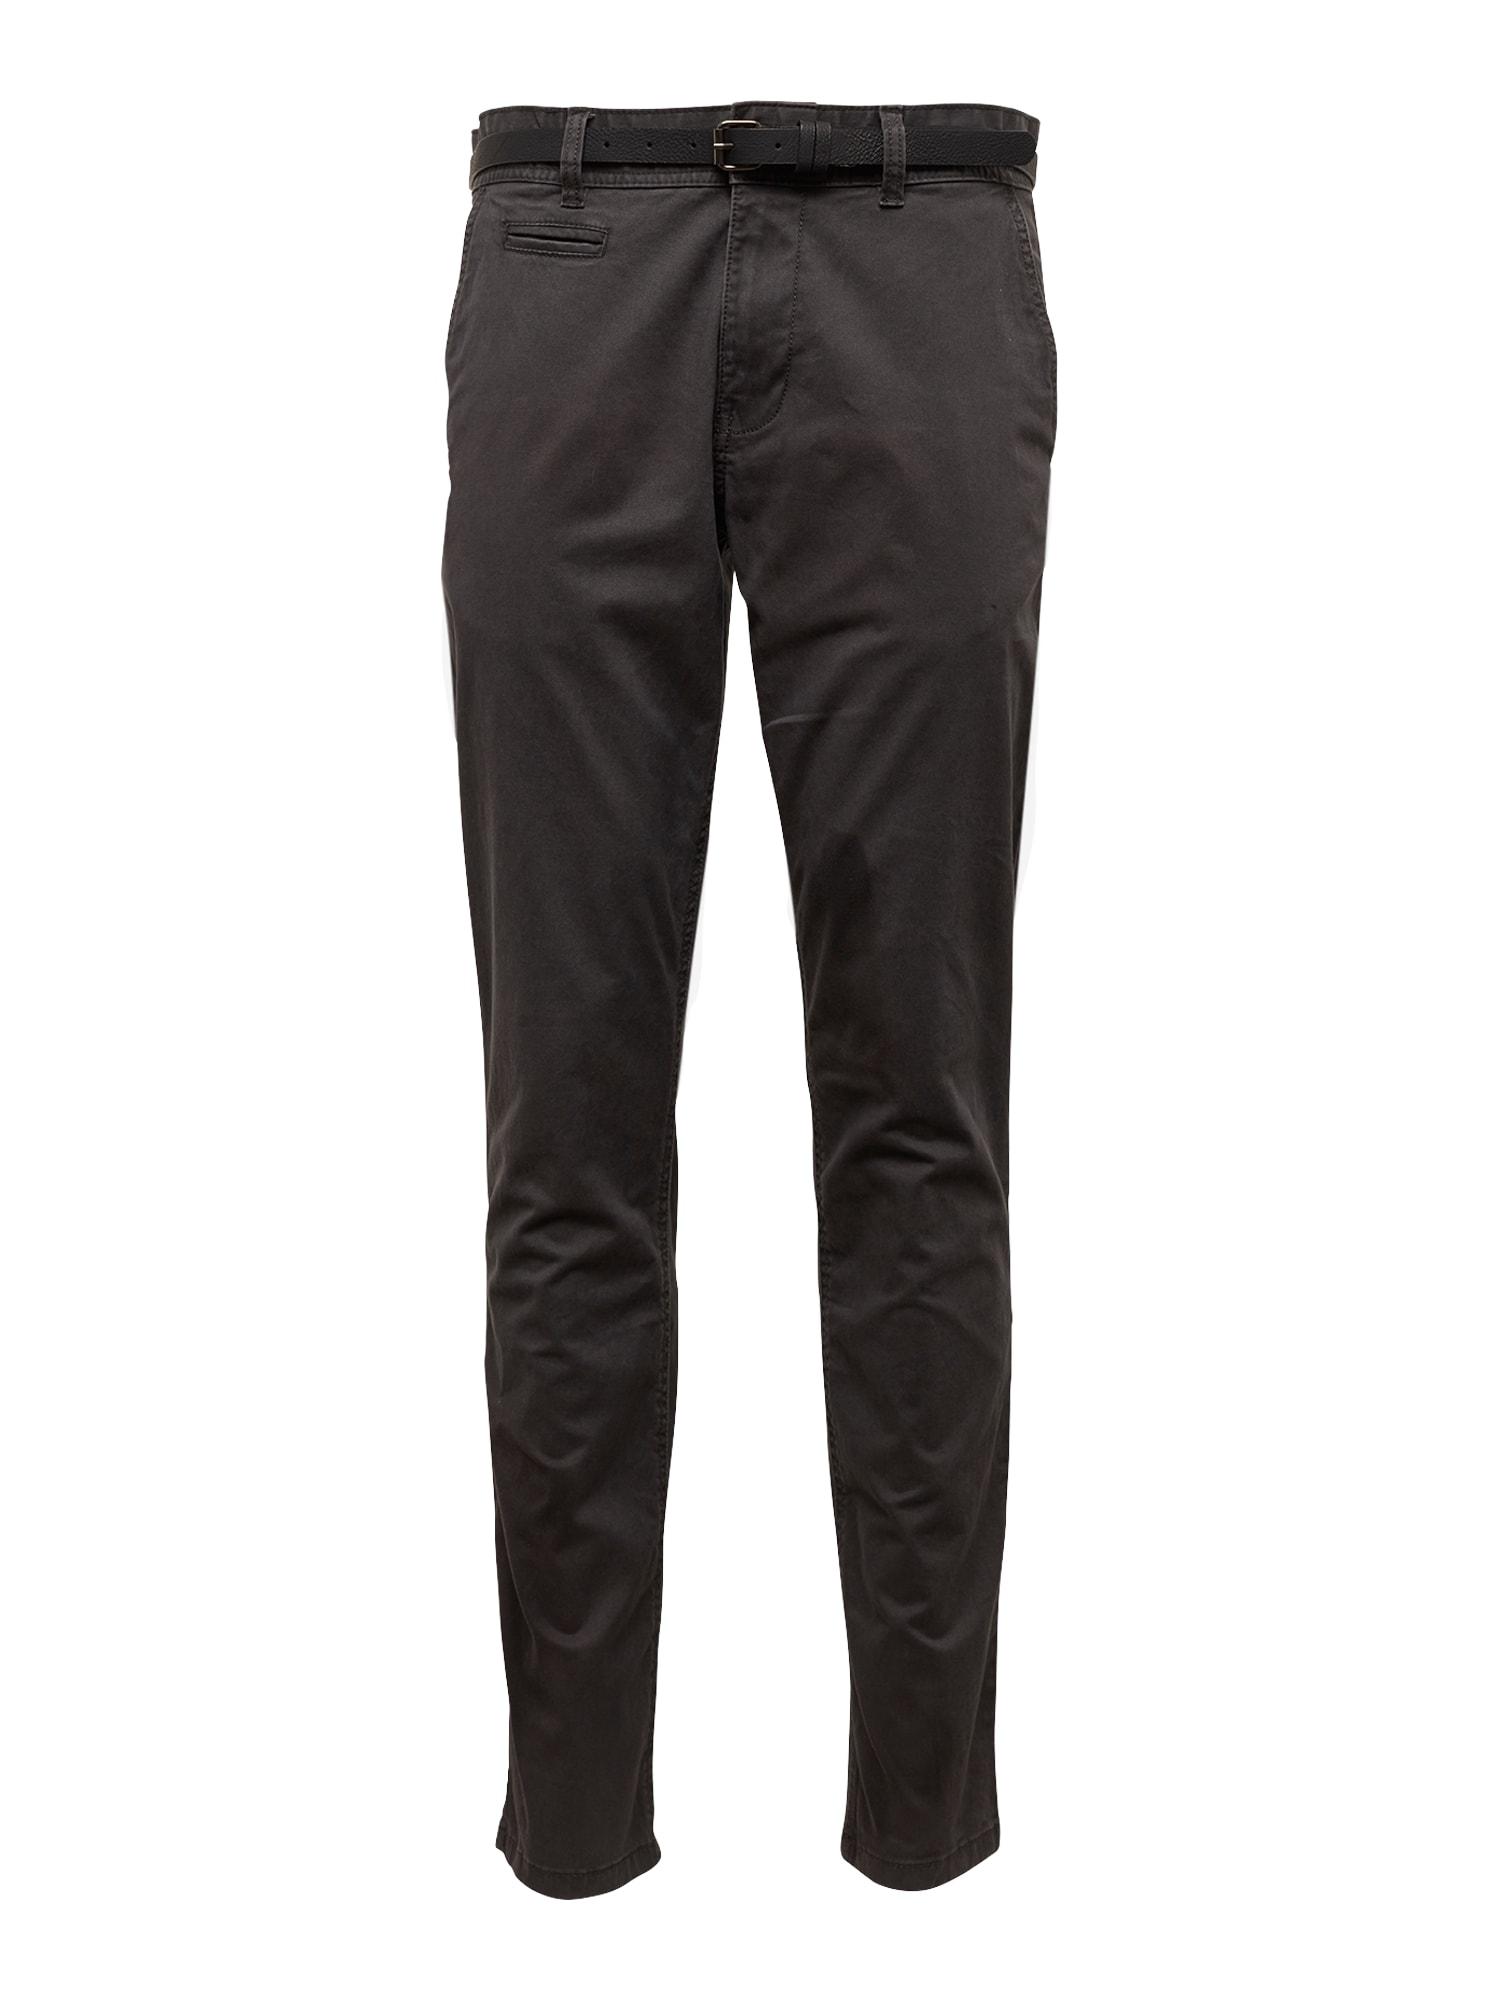 Chino kalhoty Noos Chino antracitová EDC BY ESPRIT